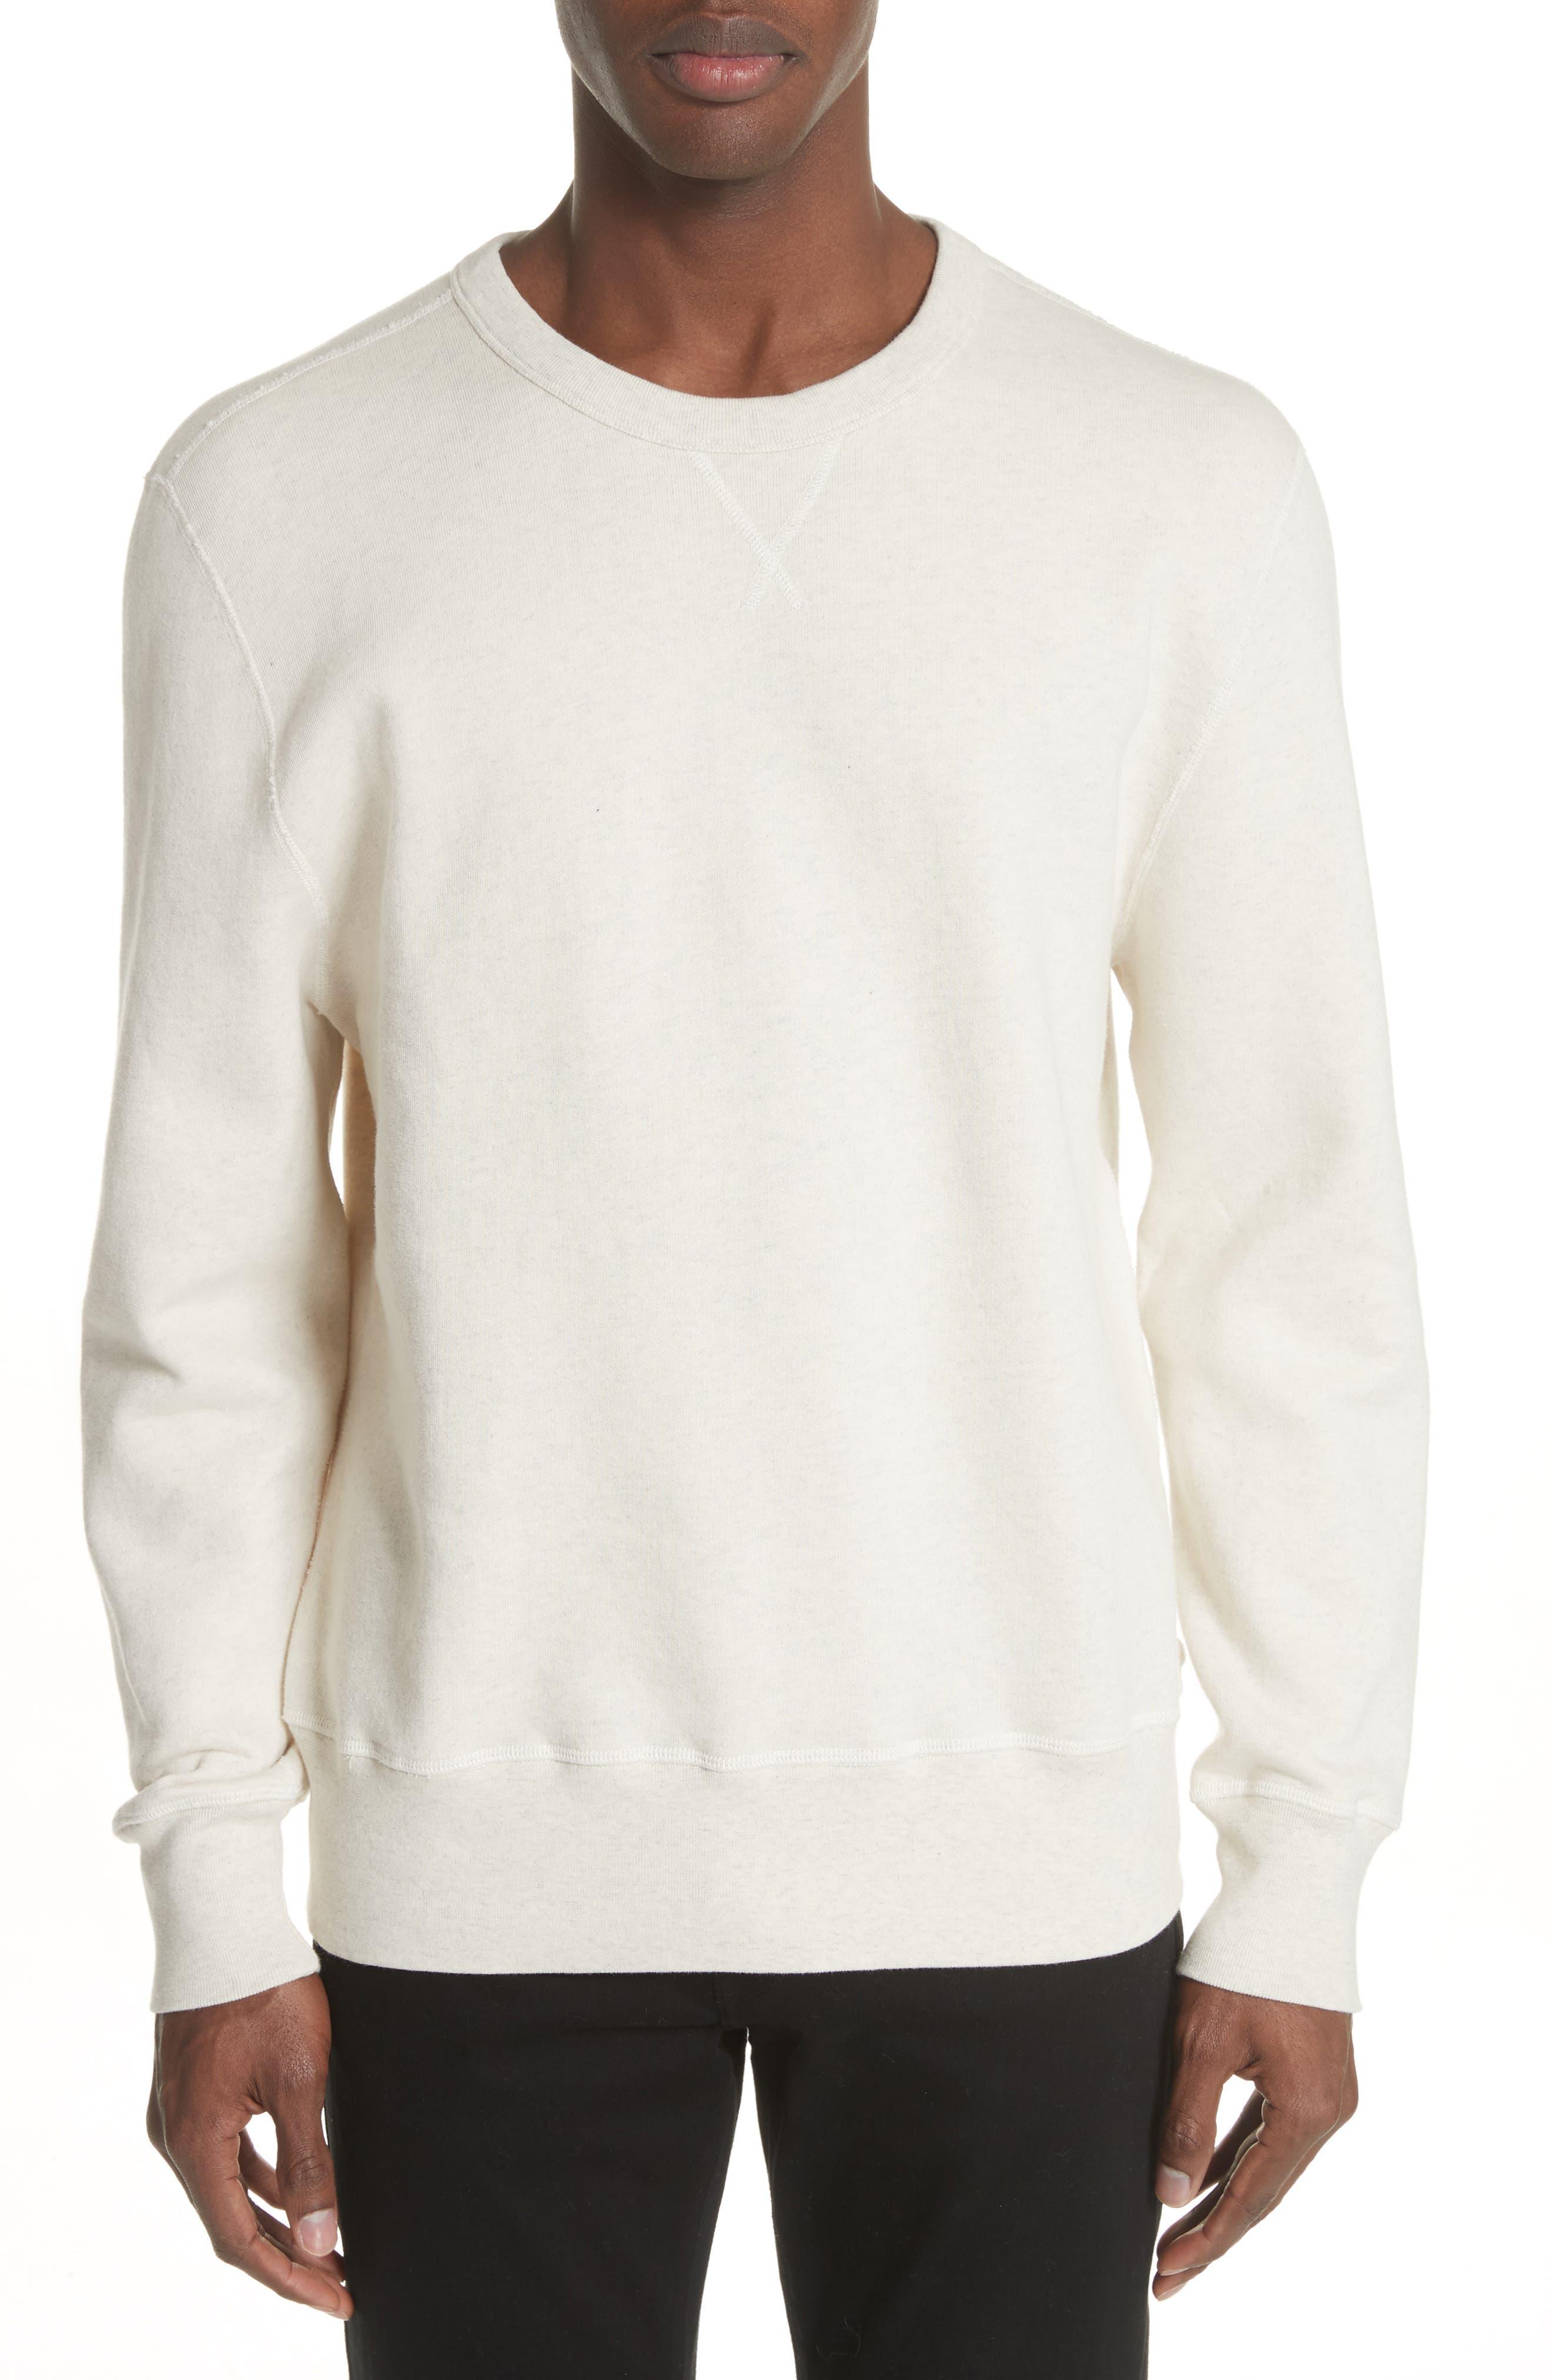 Alternate Image 1 Selected - OUR LEGACY Crewneck Sweatshirt